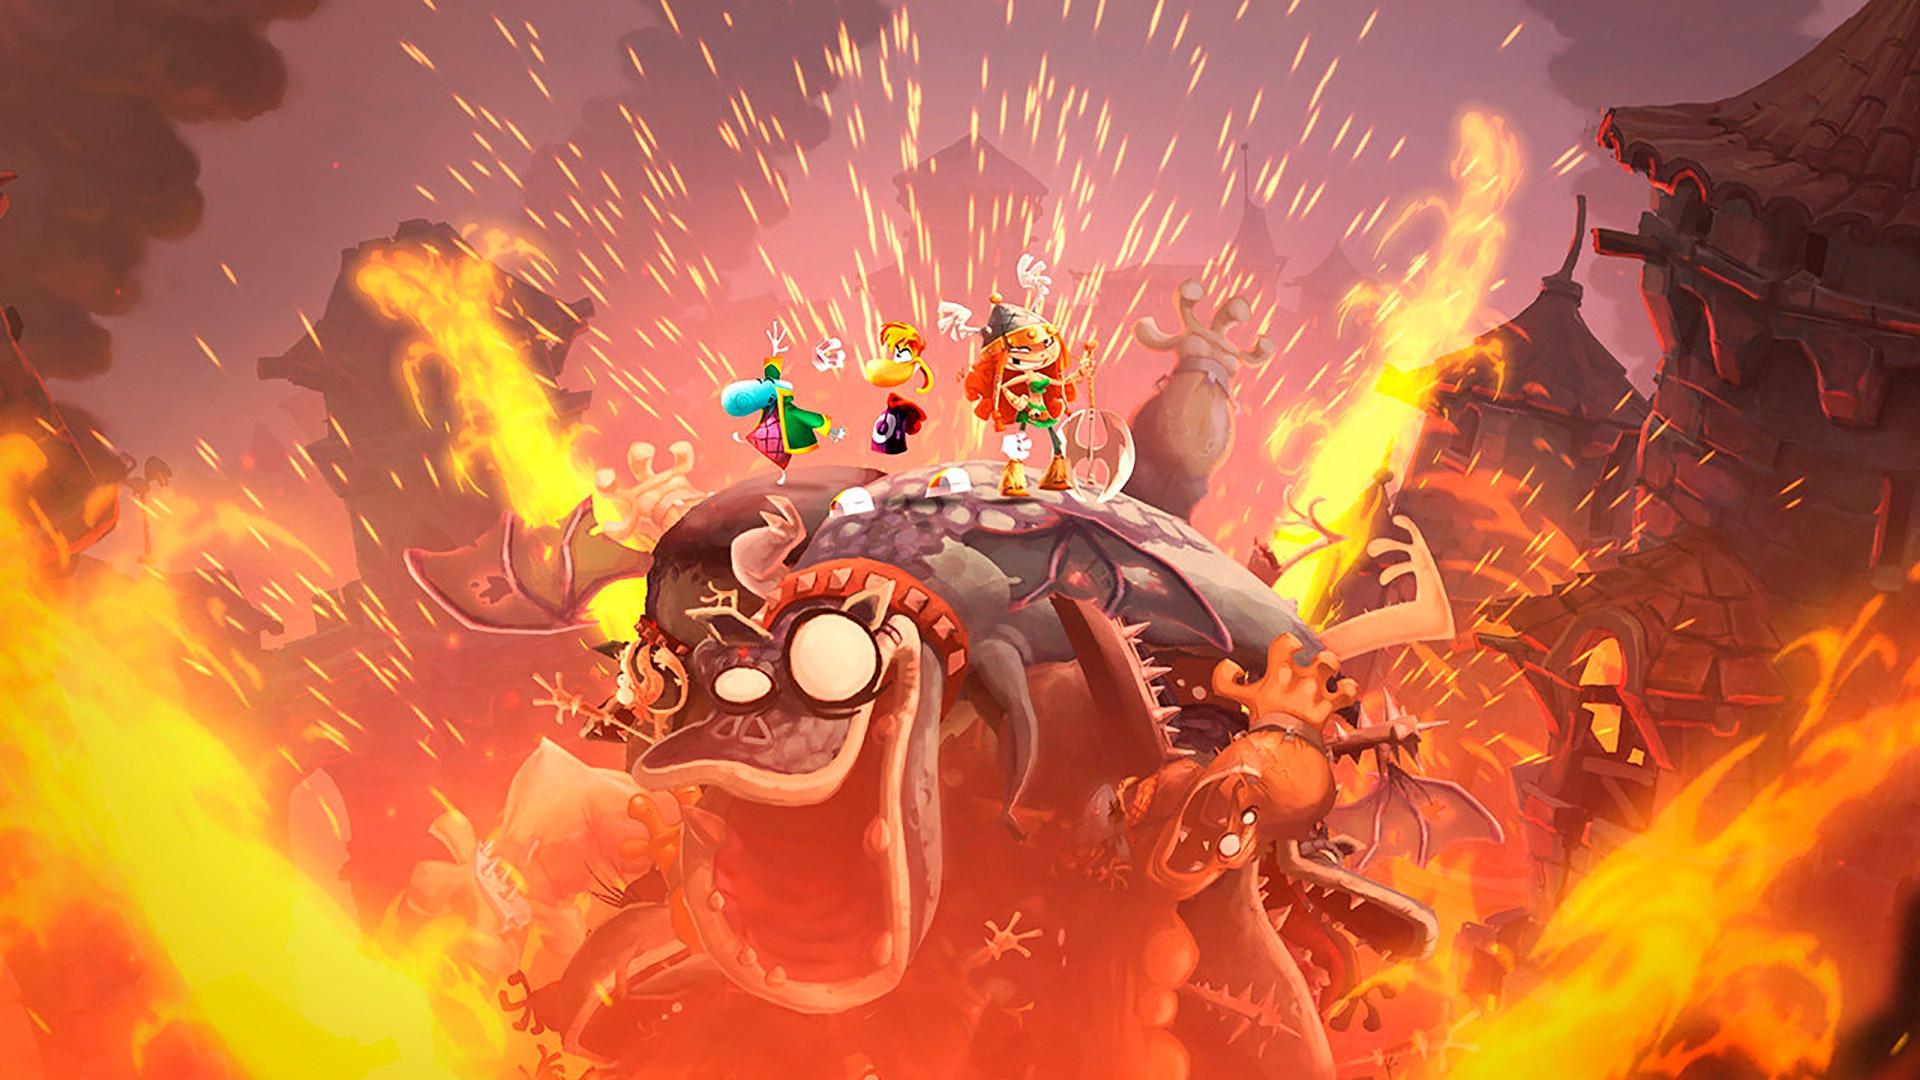 В Epic Games Store в течение недели бесплатно раздают Rayman Legends